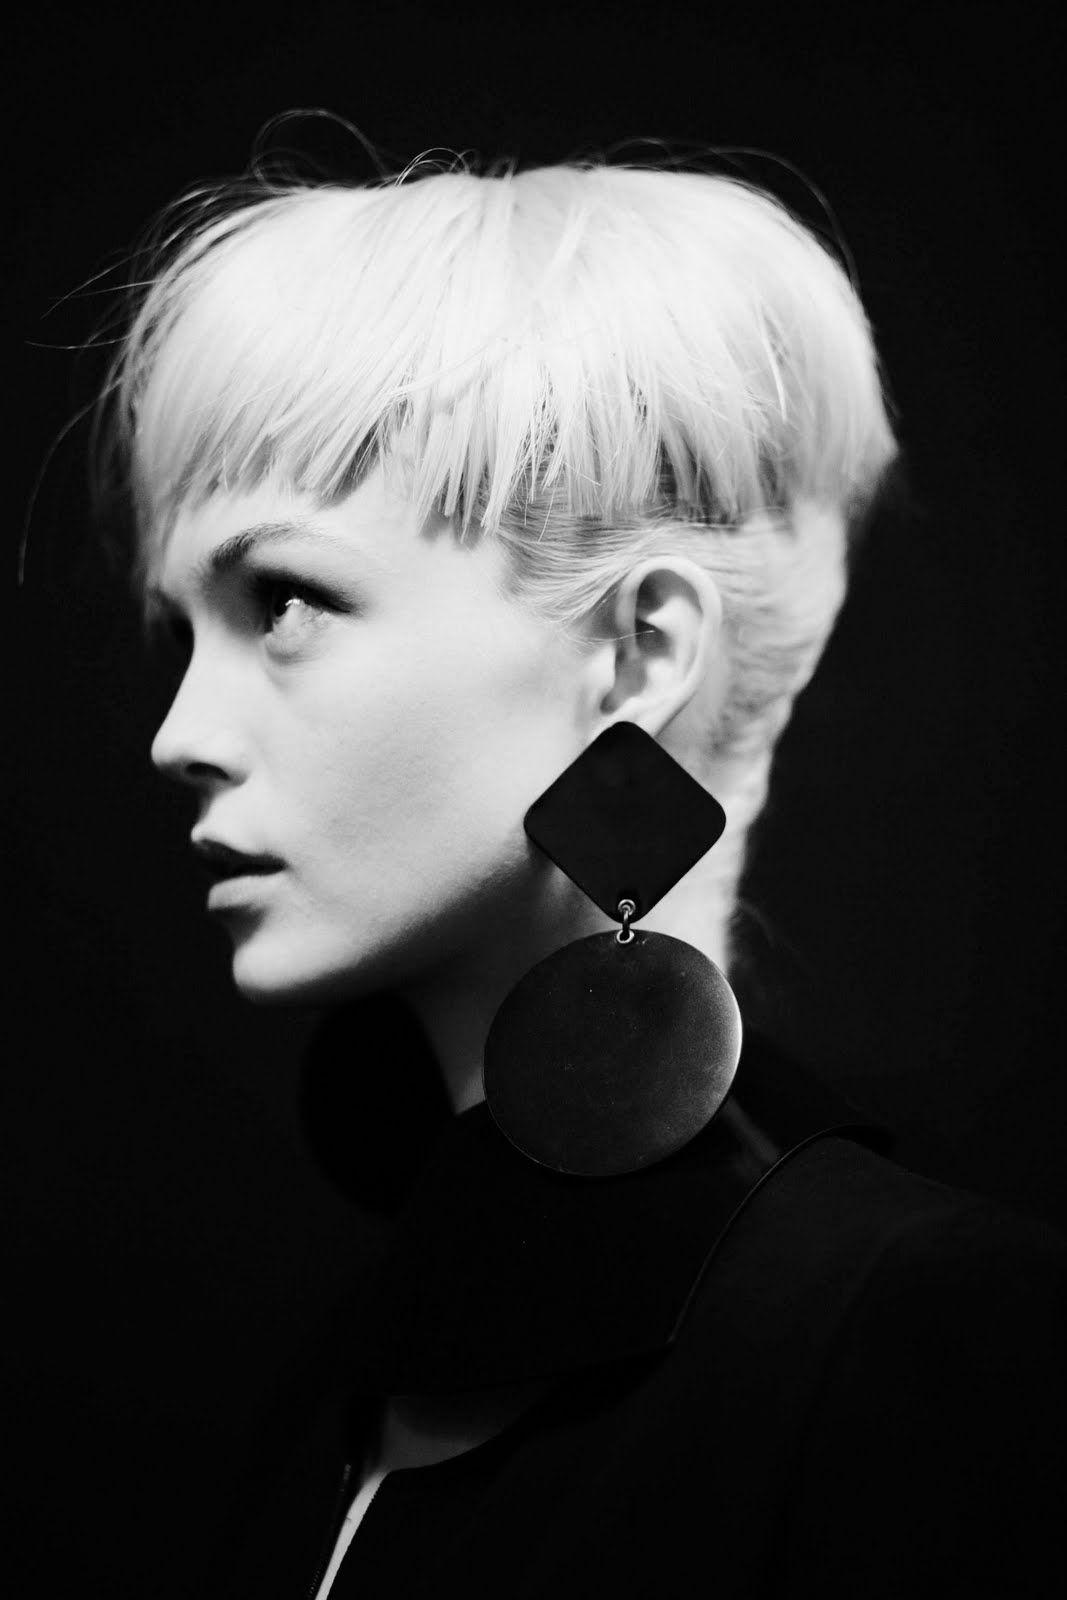 Short Haircut Shaved Sides Short Pinterest Emporio Armani